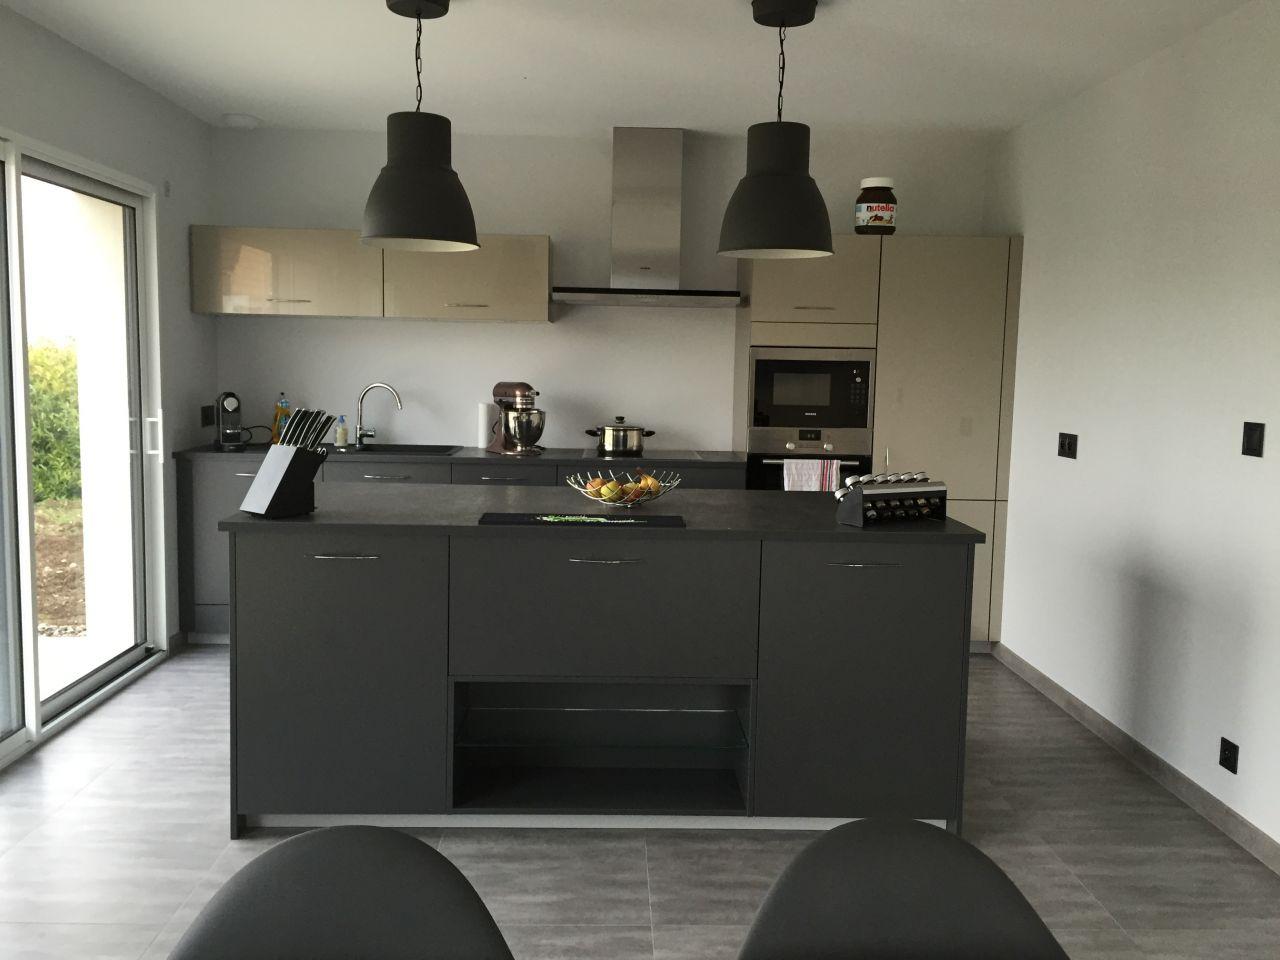 avanc e carrelage et peinture peinture au sol v33. Black Bedroom Furniture Sets. Home Design Ideas